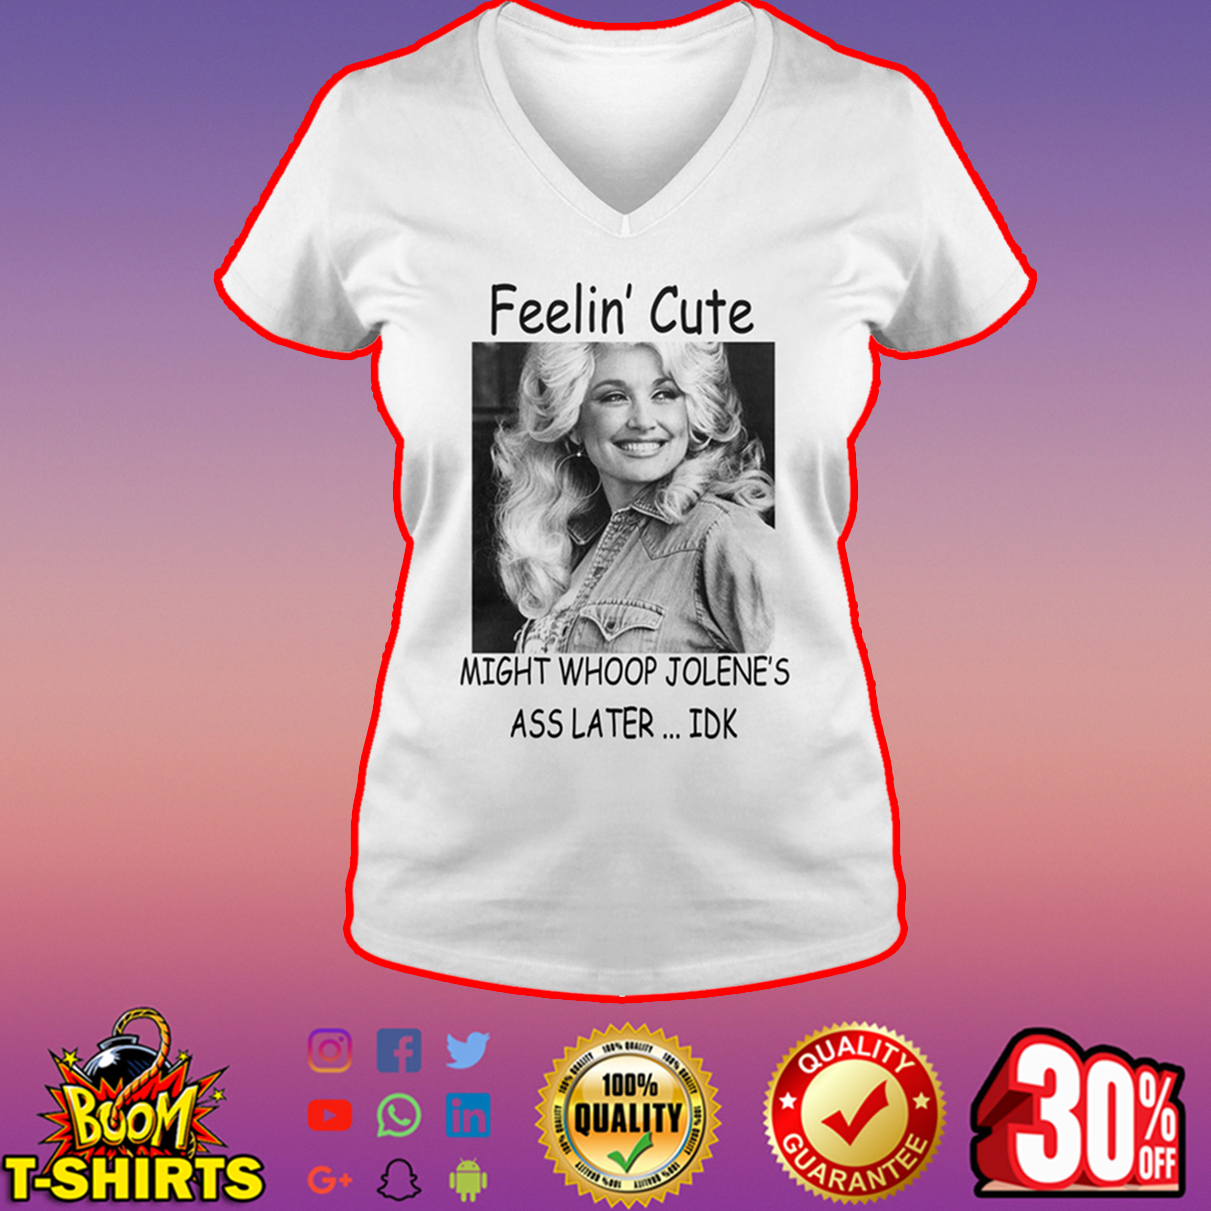 Dolly Parton Feelin' cute might whoop jolene's ass later IDK v-neck